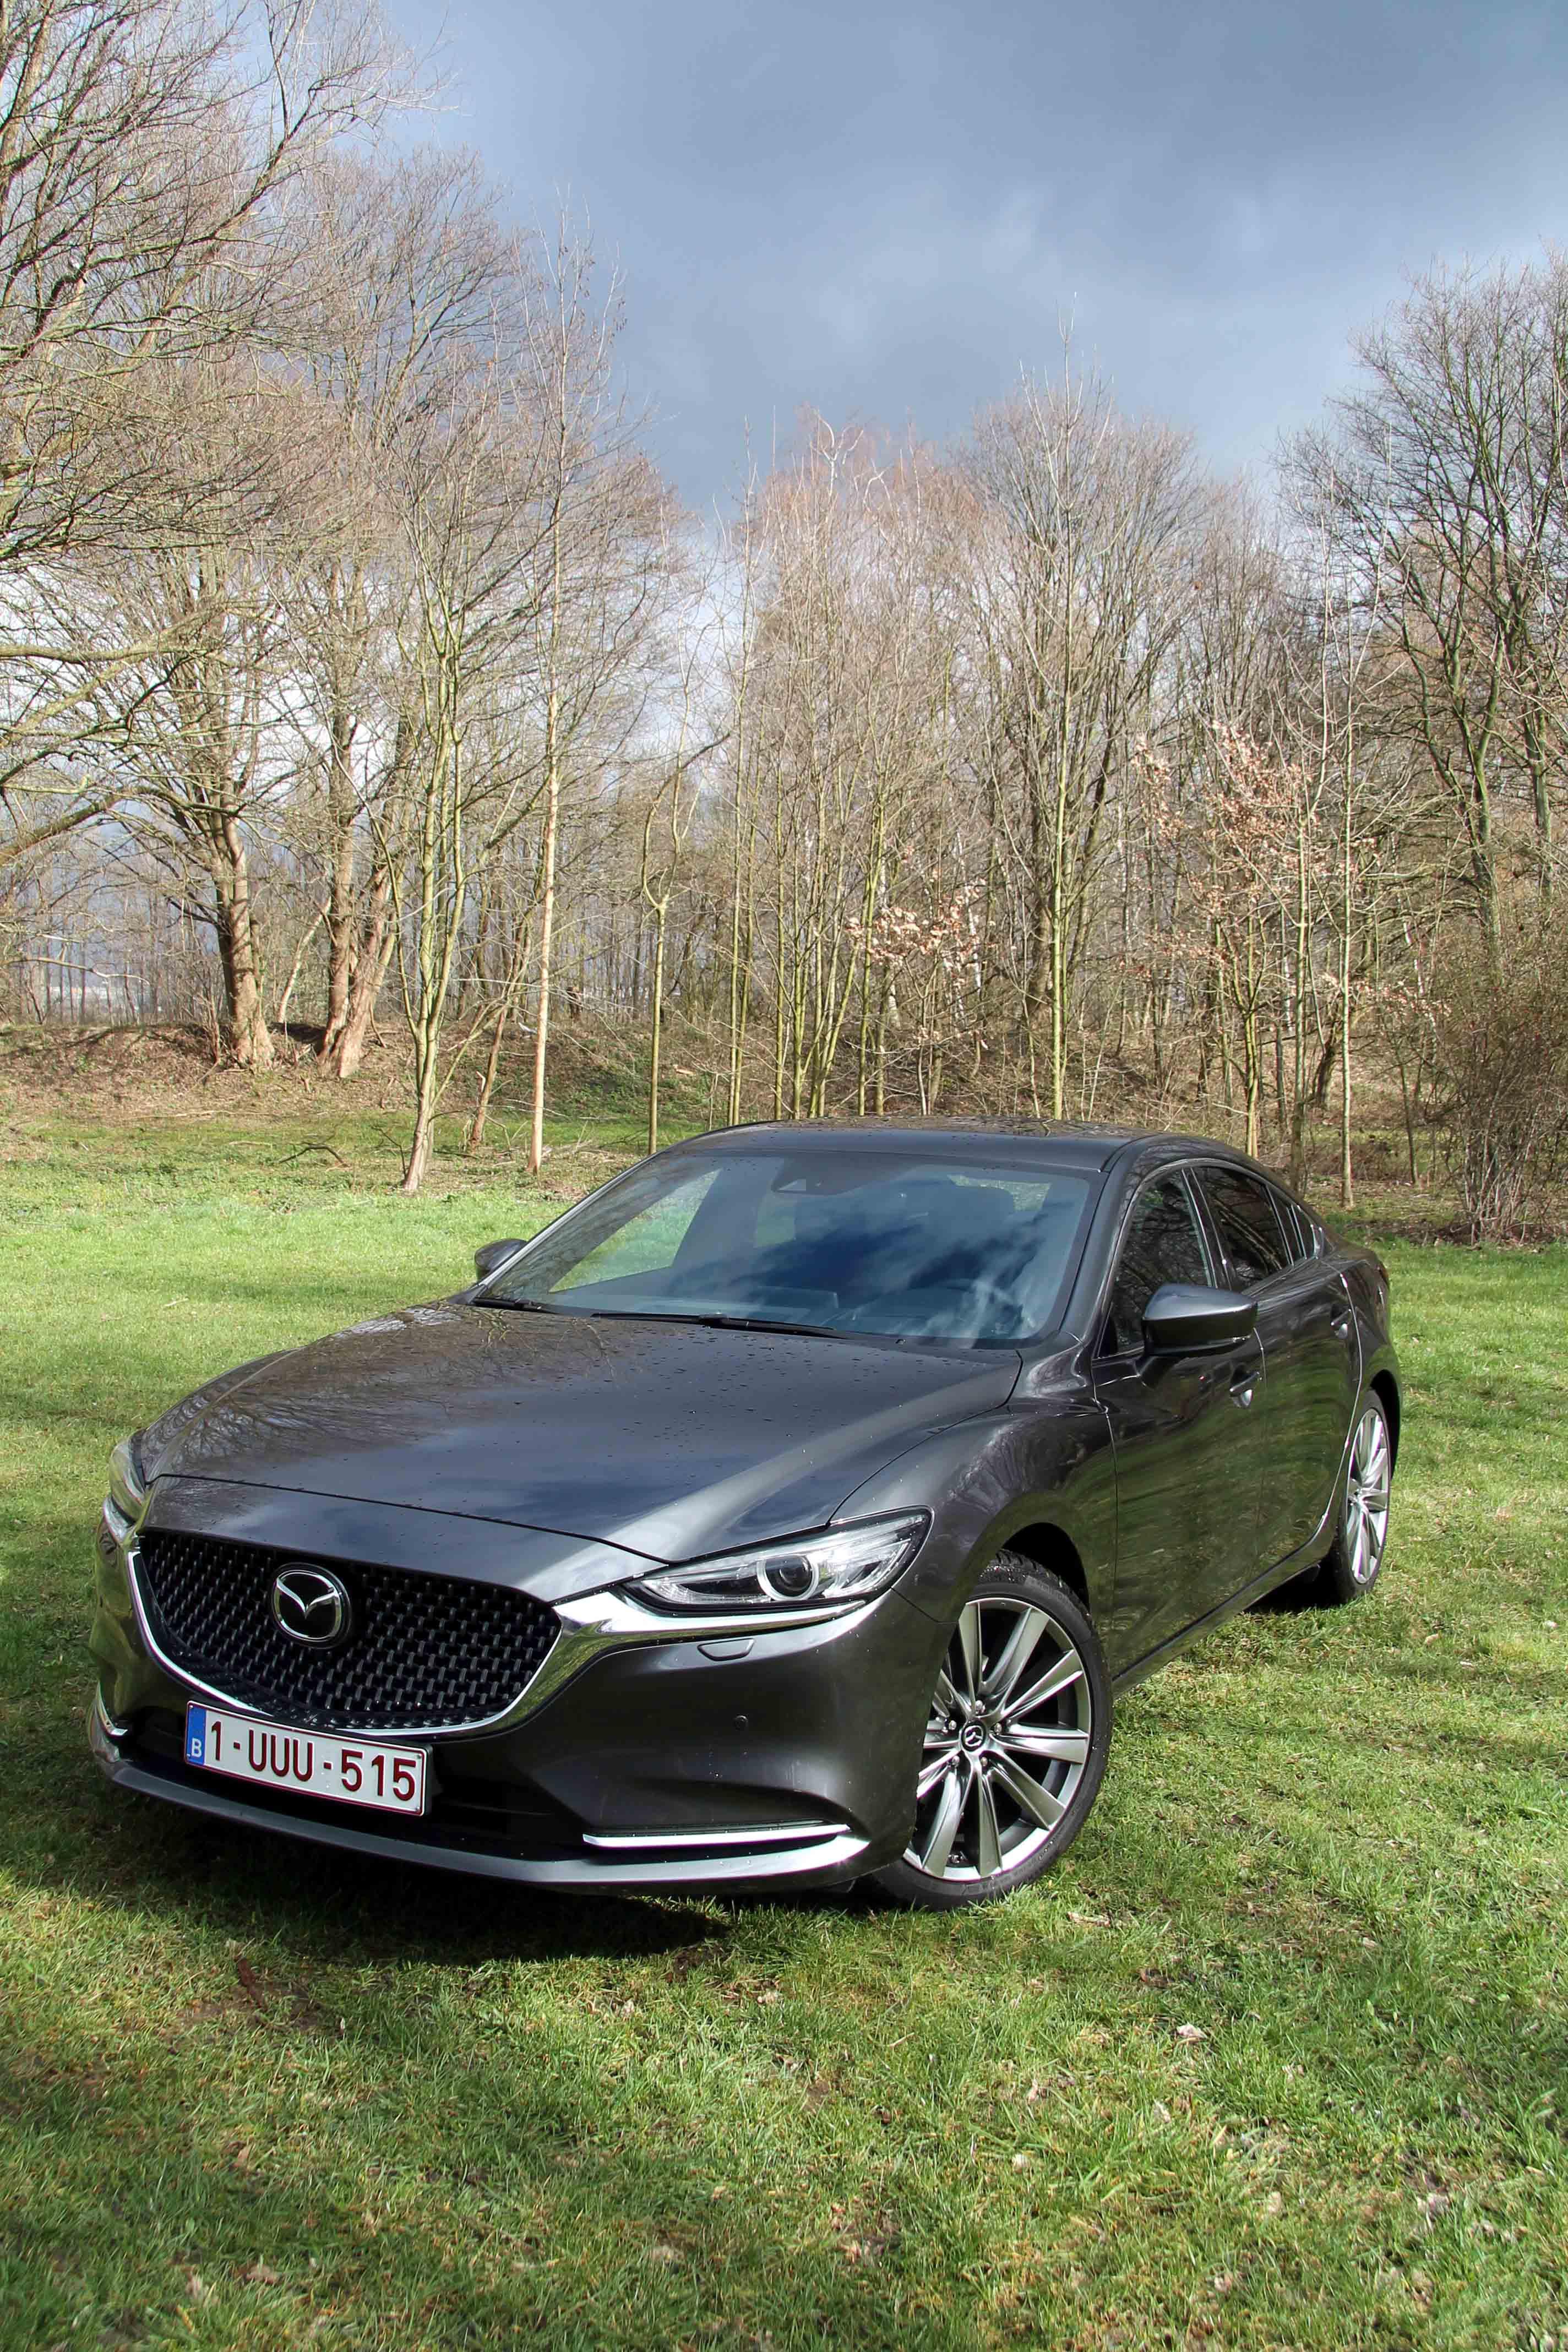 Kekurangan Mazda Skyactiv G Murah Berkualitas